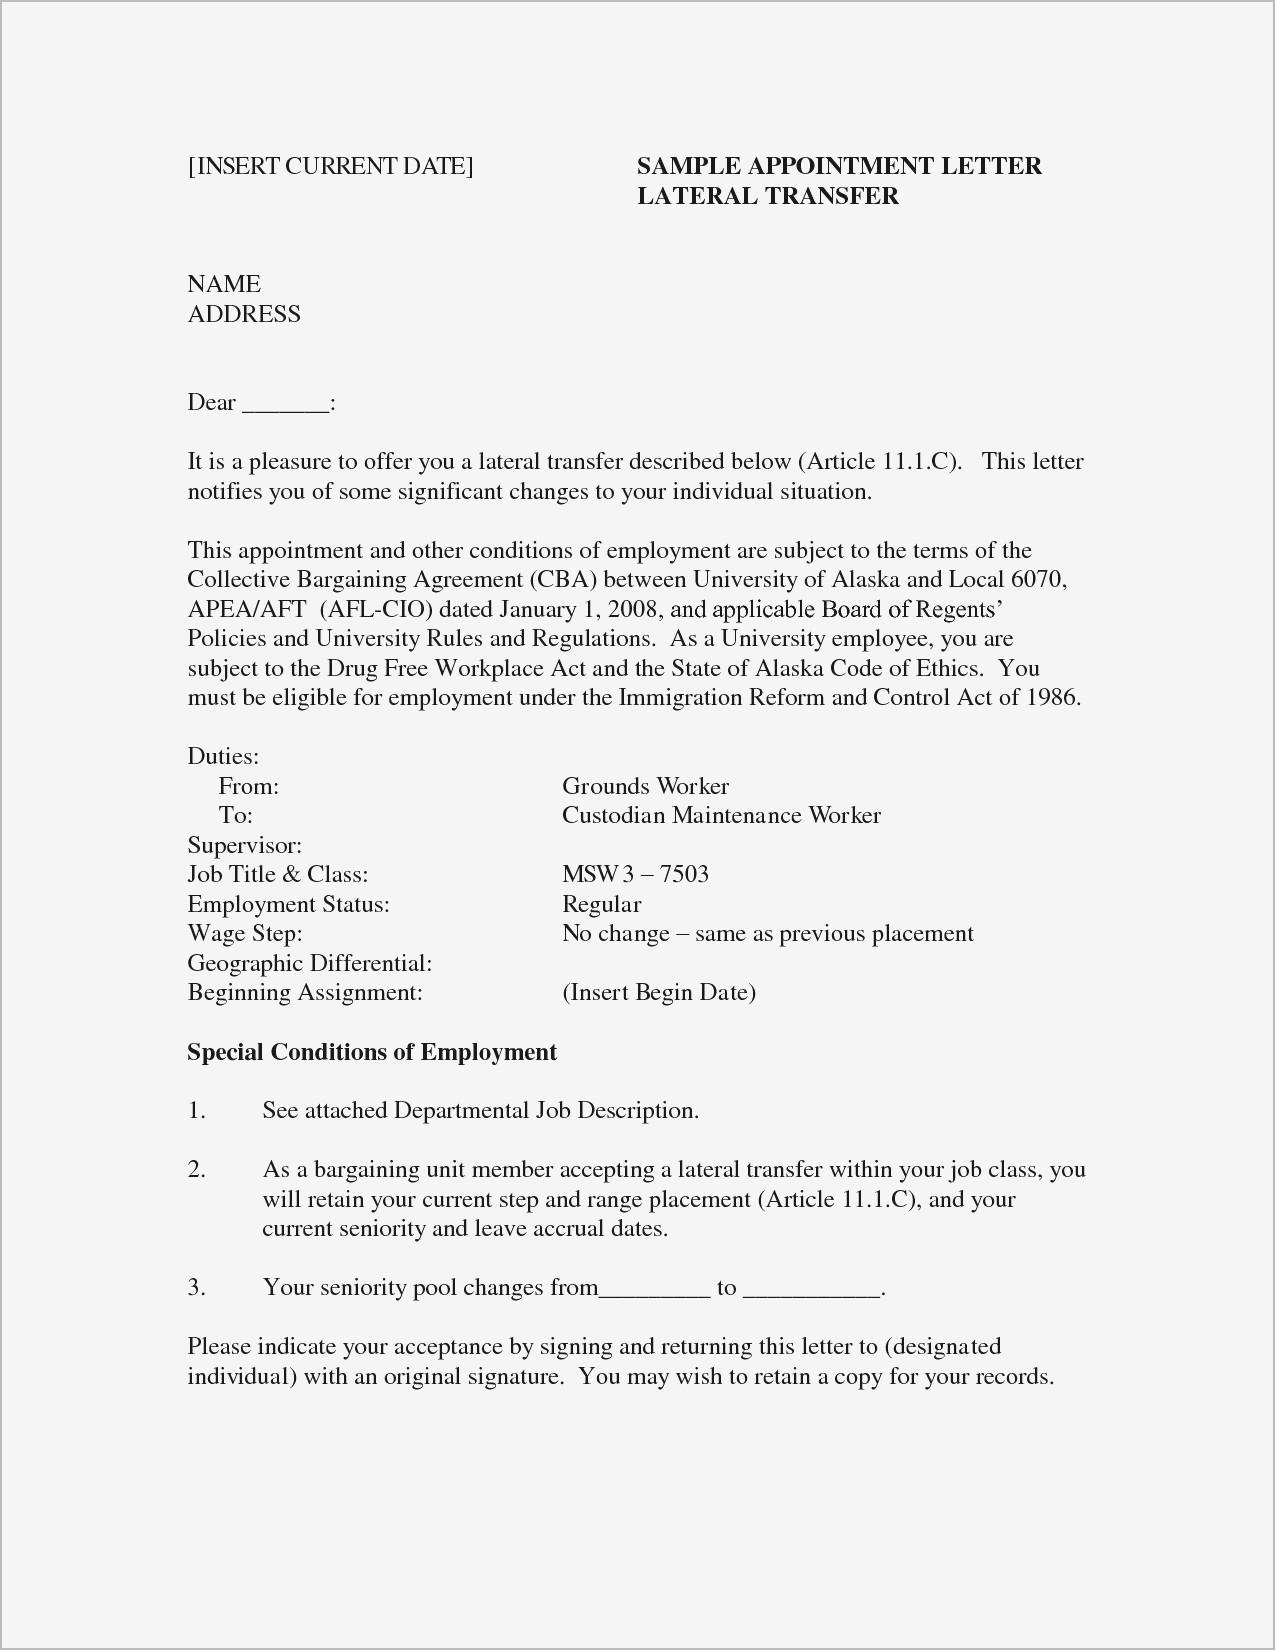 New Employee Offer Letter Template - Sample Cover Letter for Job Fer Refrence Job Fer Letter Template